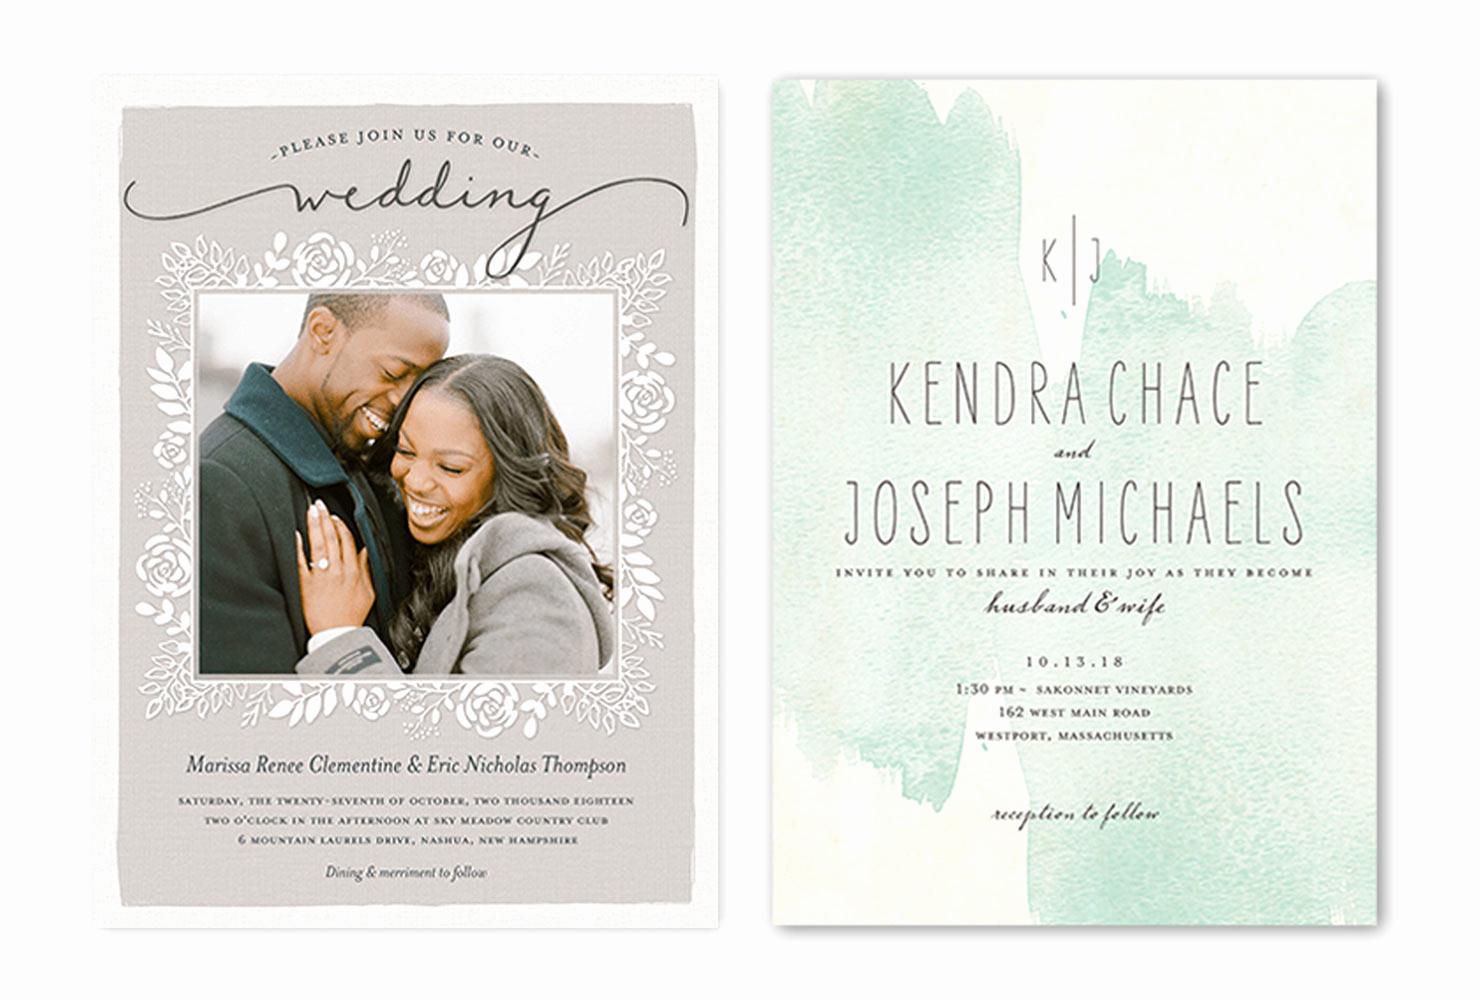 Wedding Invitation Wording Couple Hosting Luxury 35 Wedding Invitation Wording Examples 2019